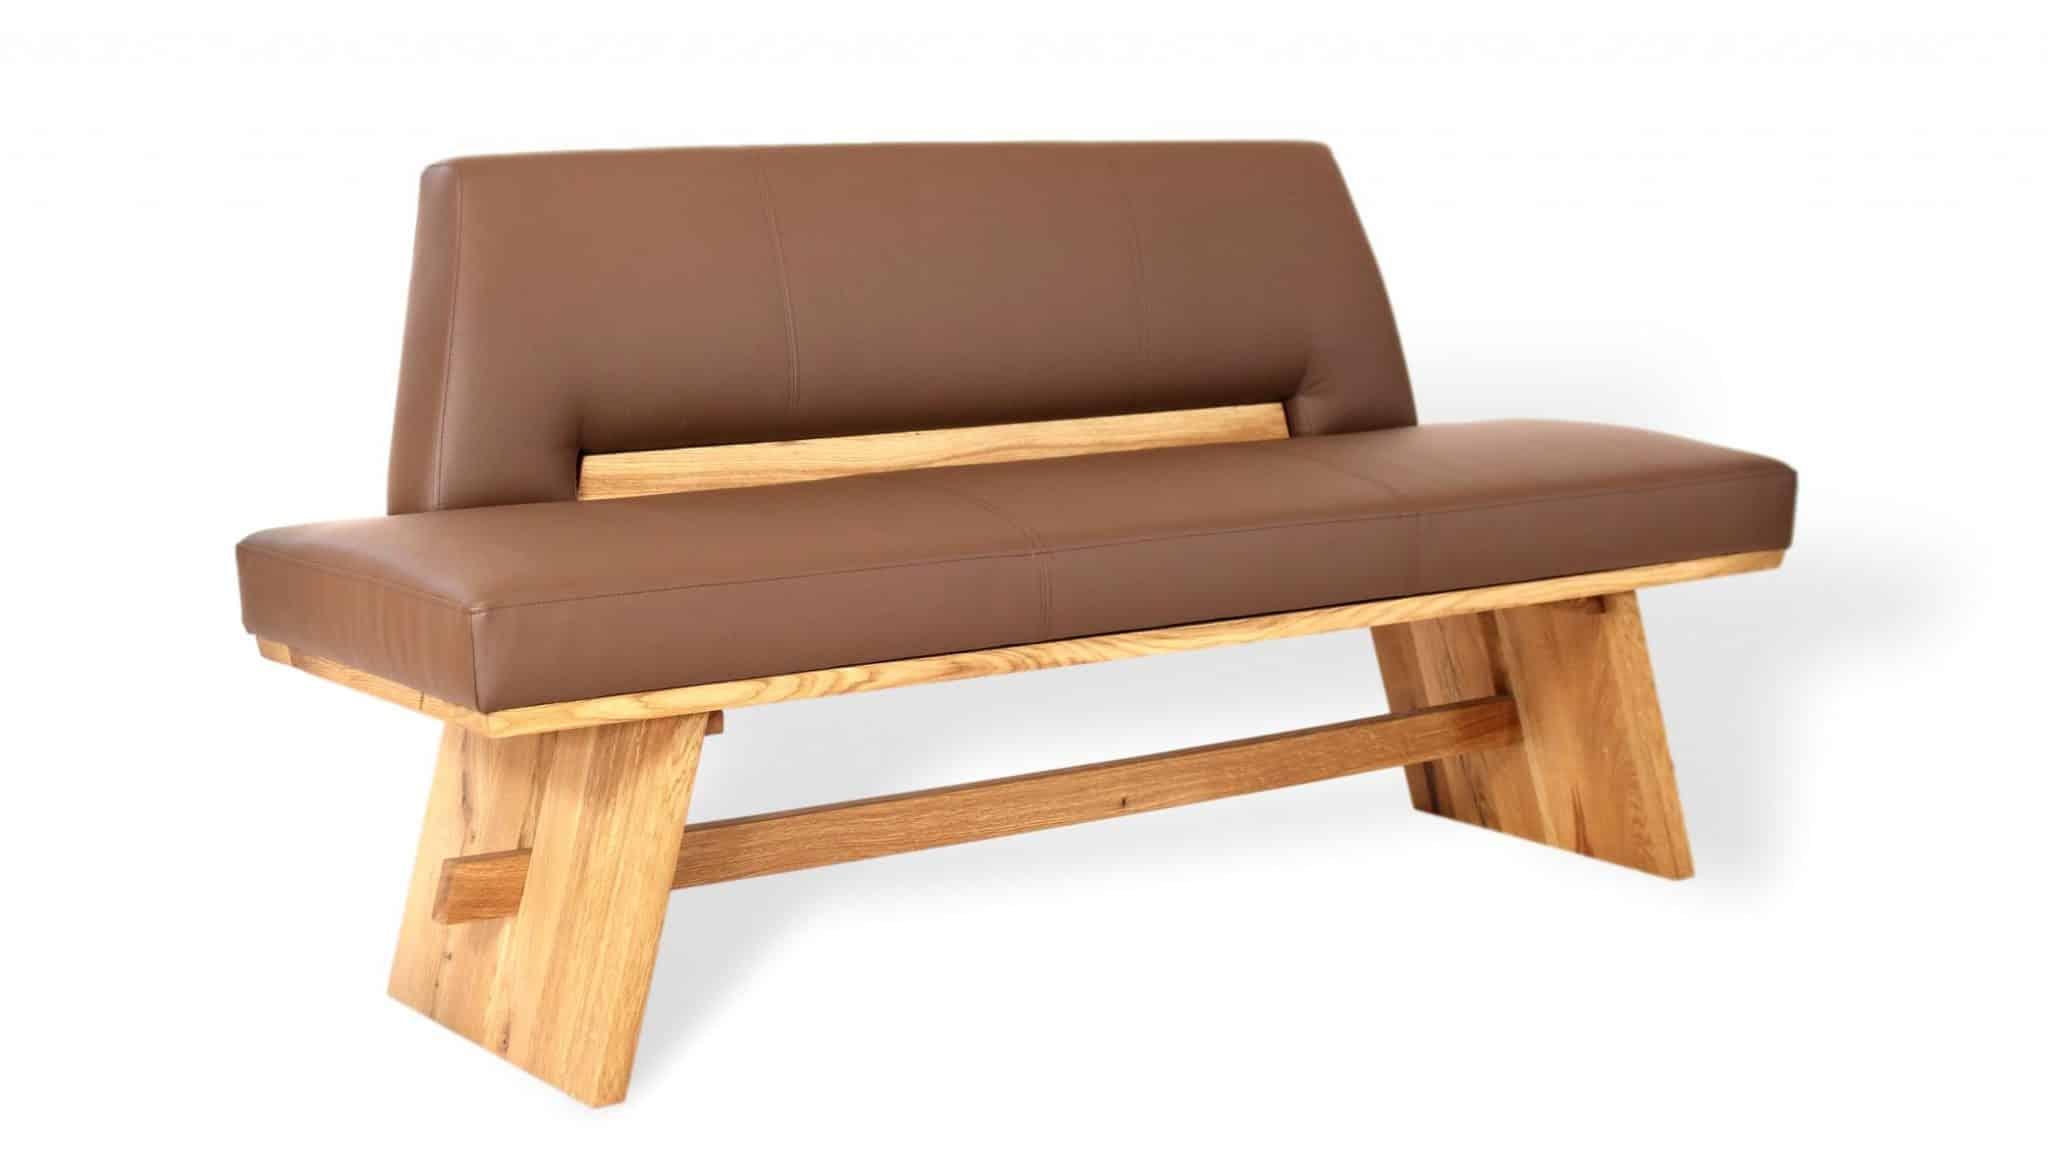 Traditionelle sitzbank aus massivholz und leder